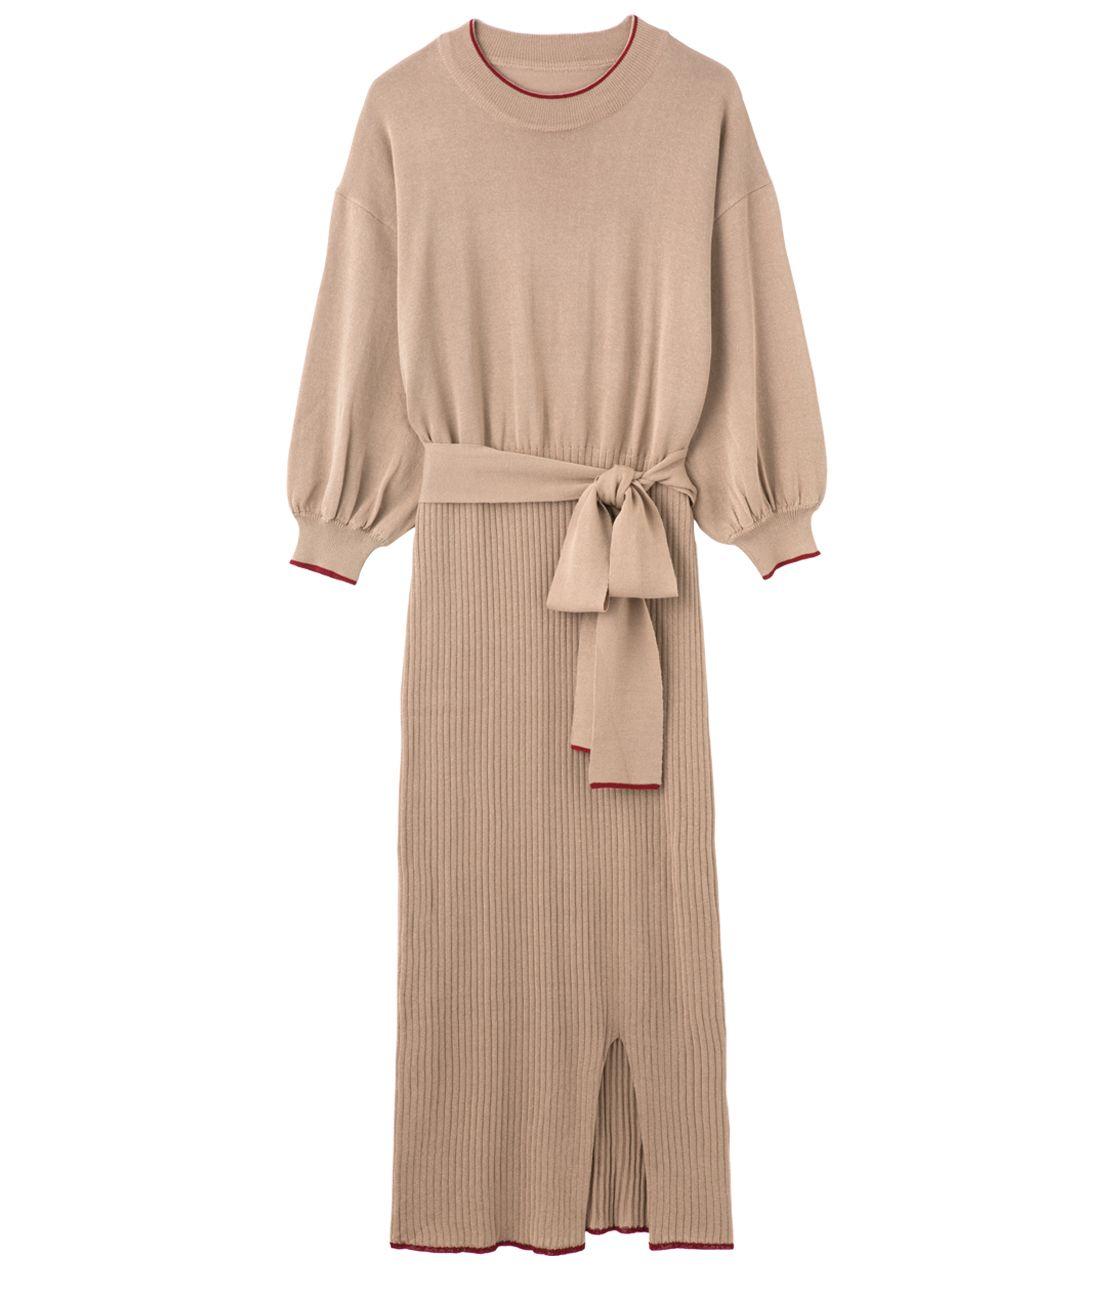 Westmark knit dress